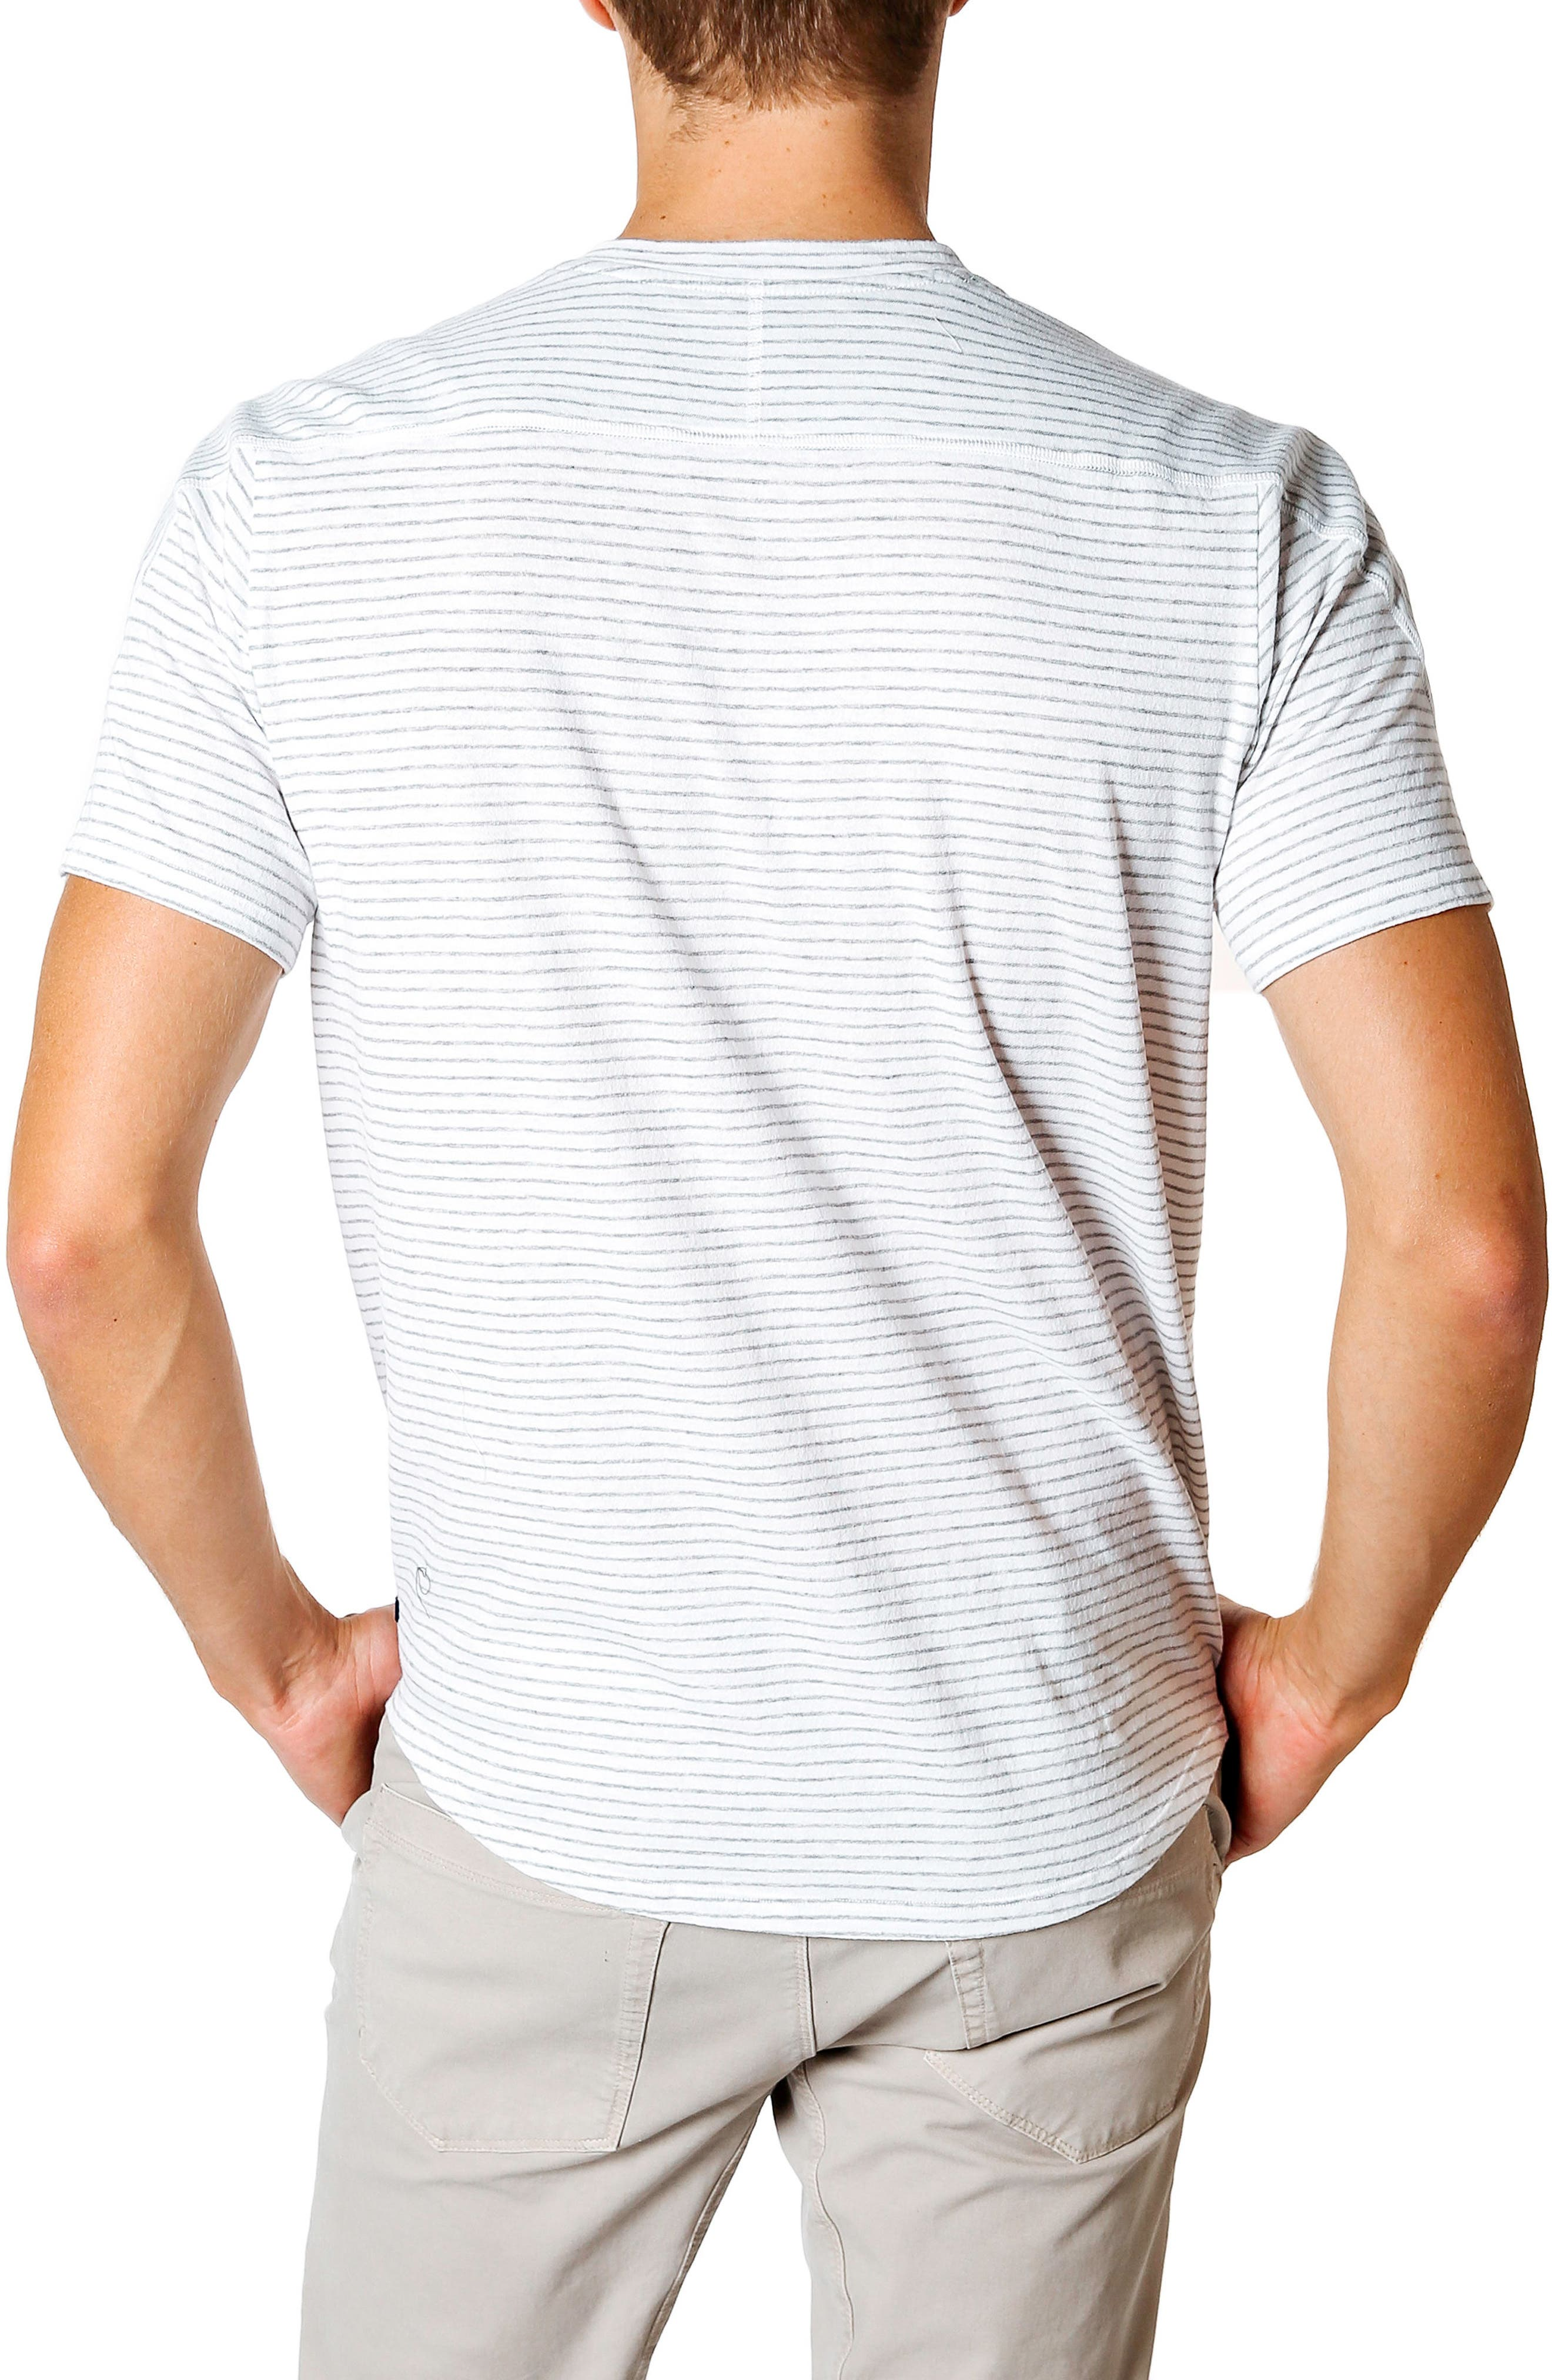 Slim Fit Stripe T-Shirt,                             Alternate thumbnail 2, color,                             White / Grey Heather